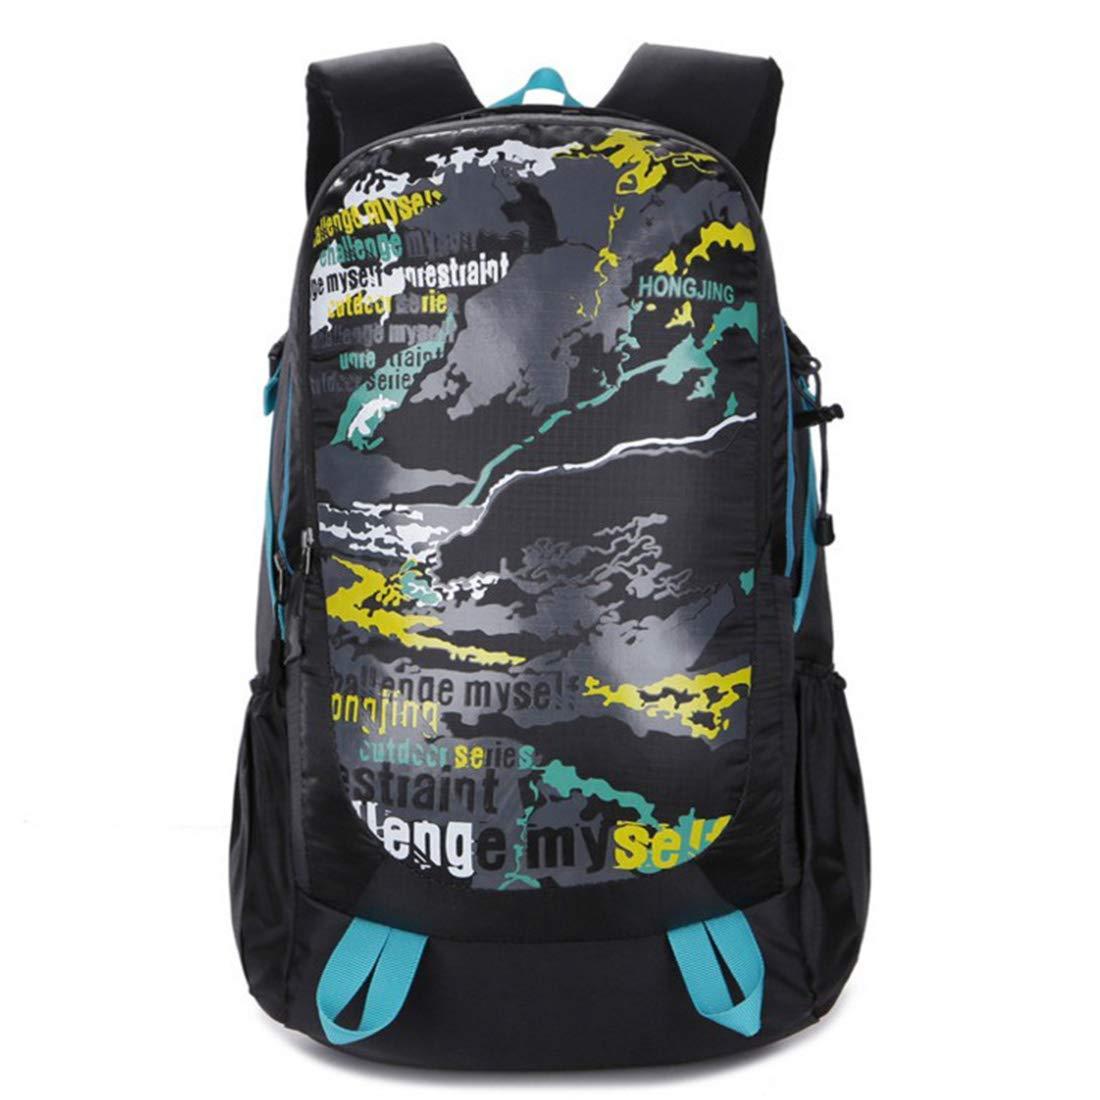 bluee MAGAI Outdoor Sports Waterproof Double Shoulder Mountaineering Bag (color   bluee)